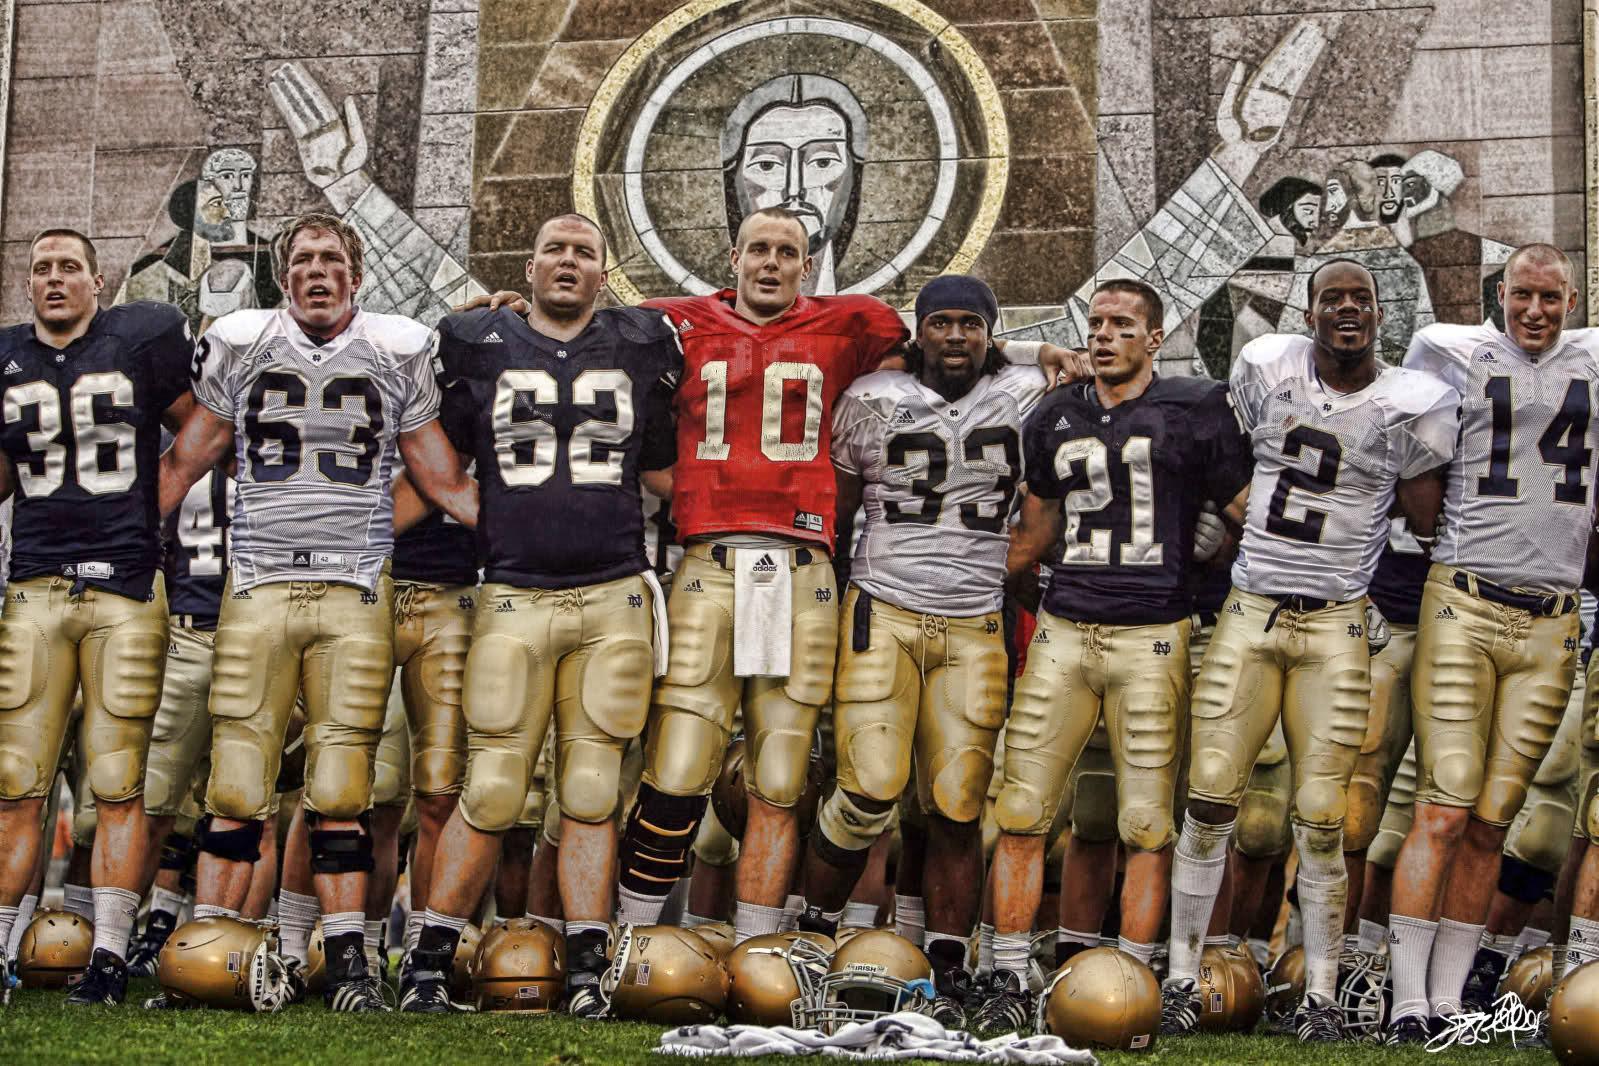 47 Notre Dame Football Hd Wallpaper On Wallpapersafari